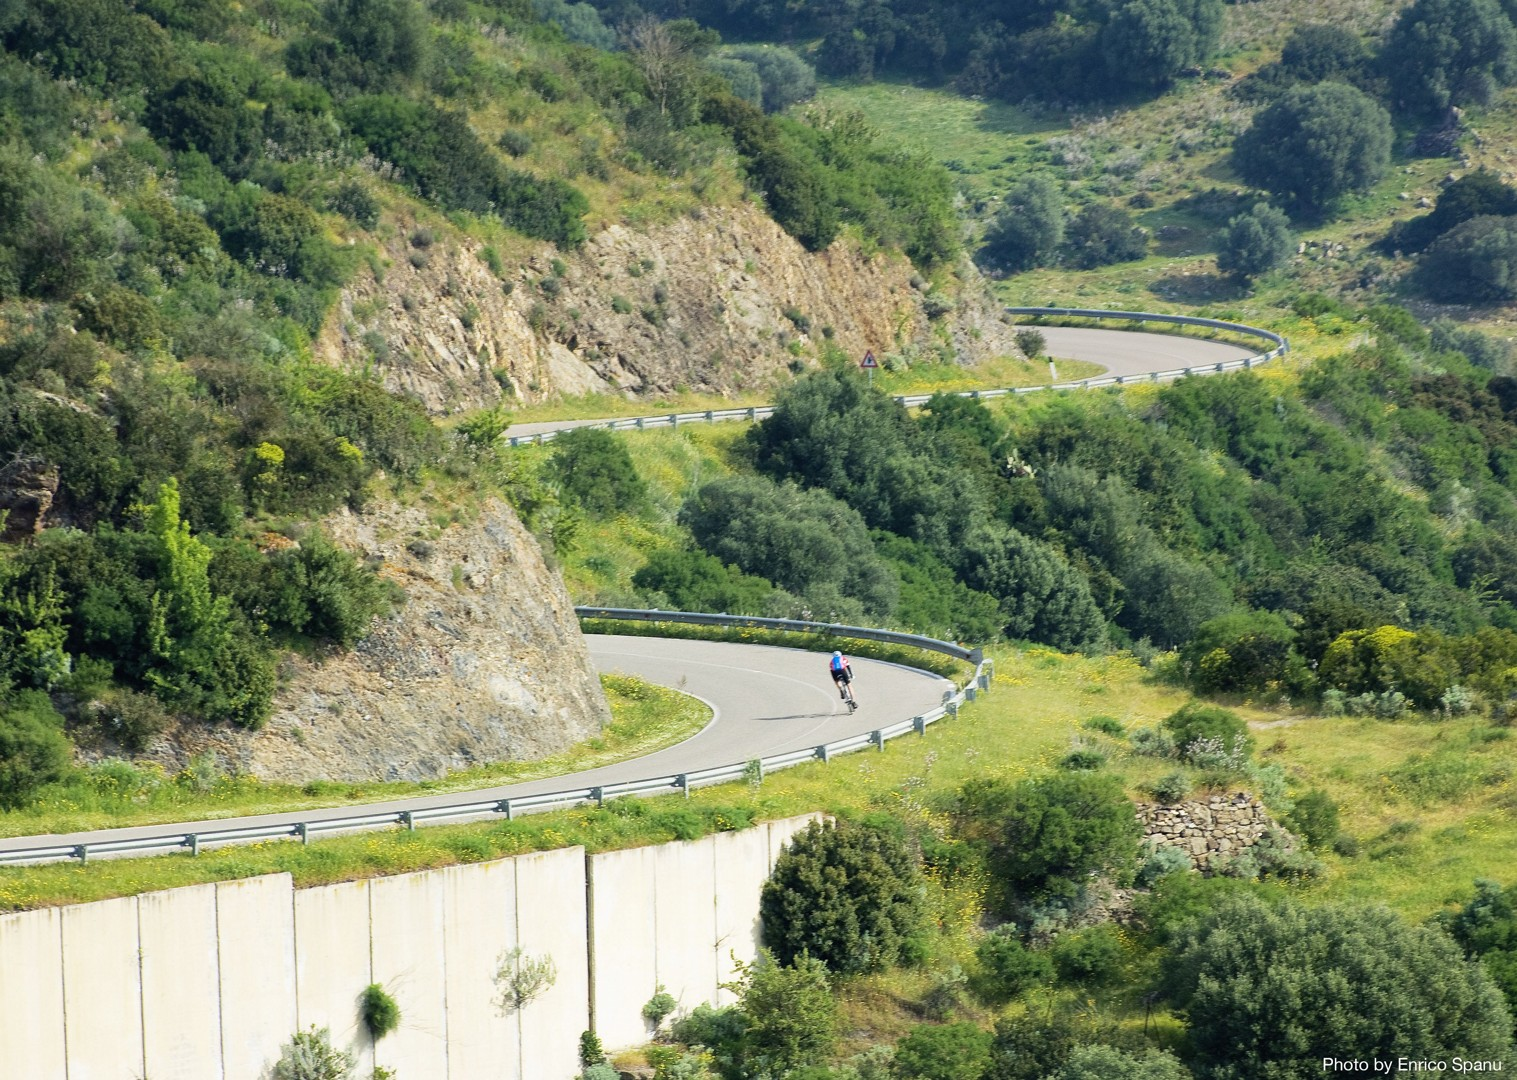 Sardinia-Sardinian-Mountains-Guided-Road-Cycling-Holiday-Monte-Albo.jpg - Italy - Sardinia - Sardinian Mountains - Guided Road Cycling Holiday - Italia Road Cycling